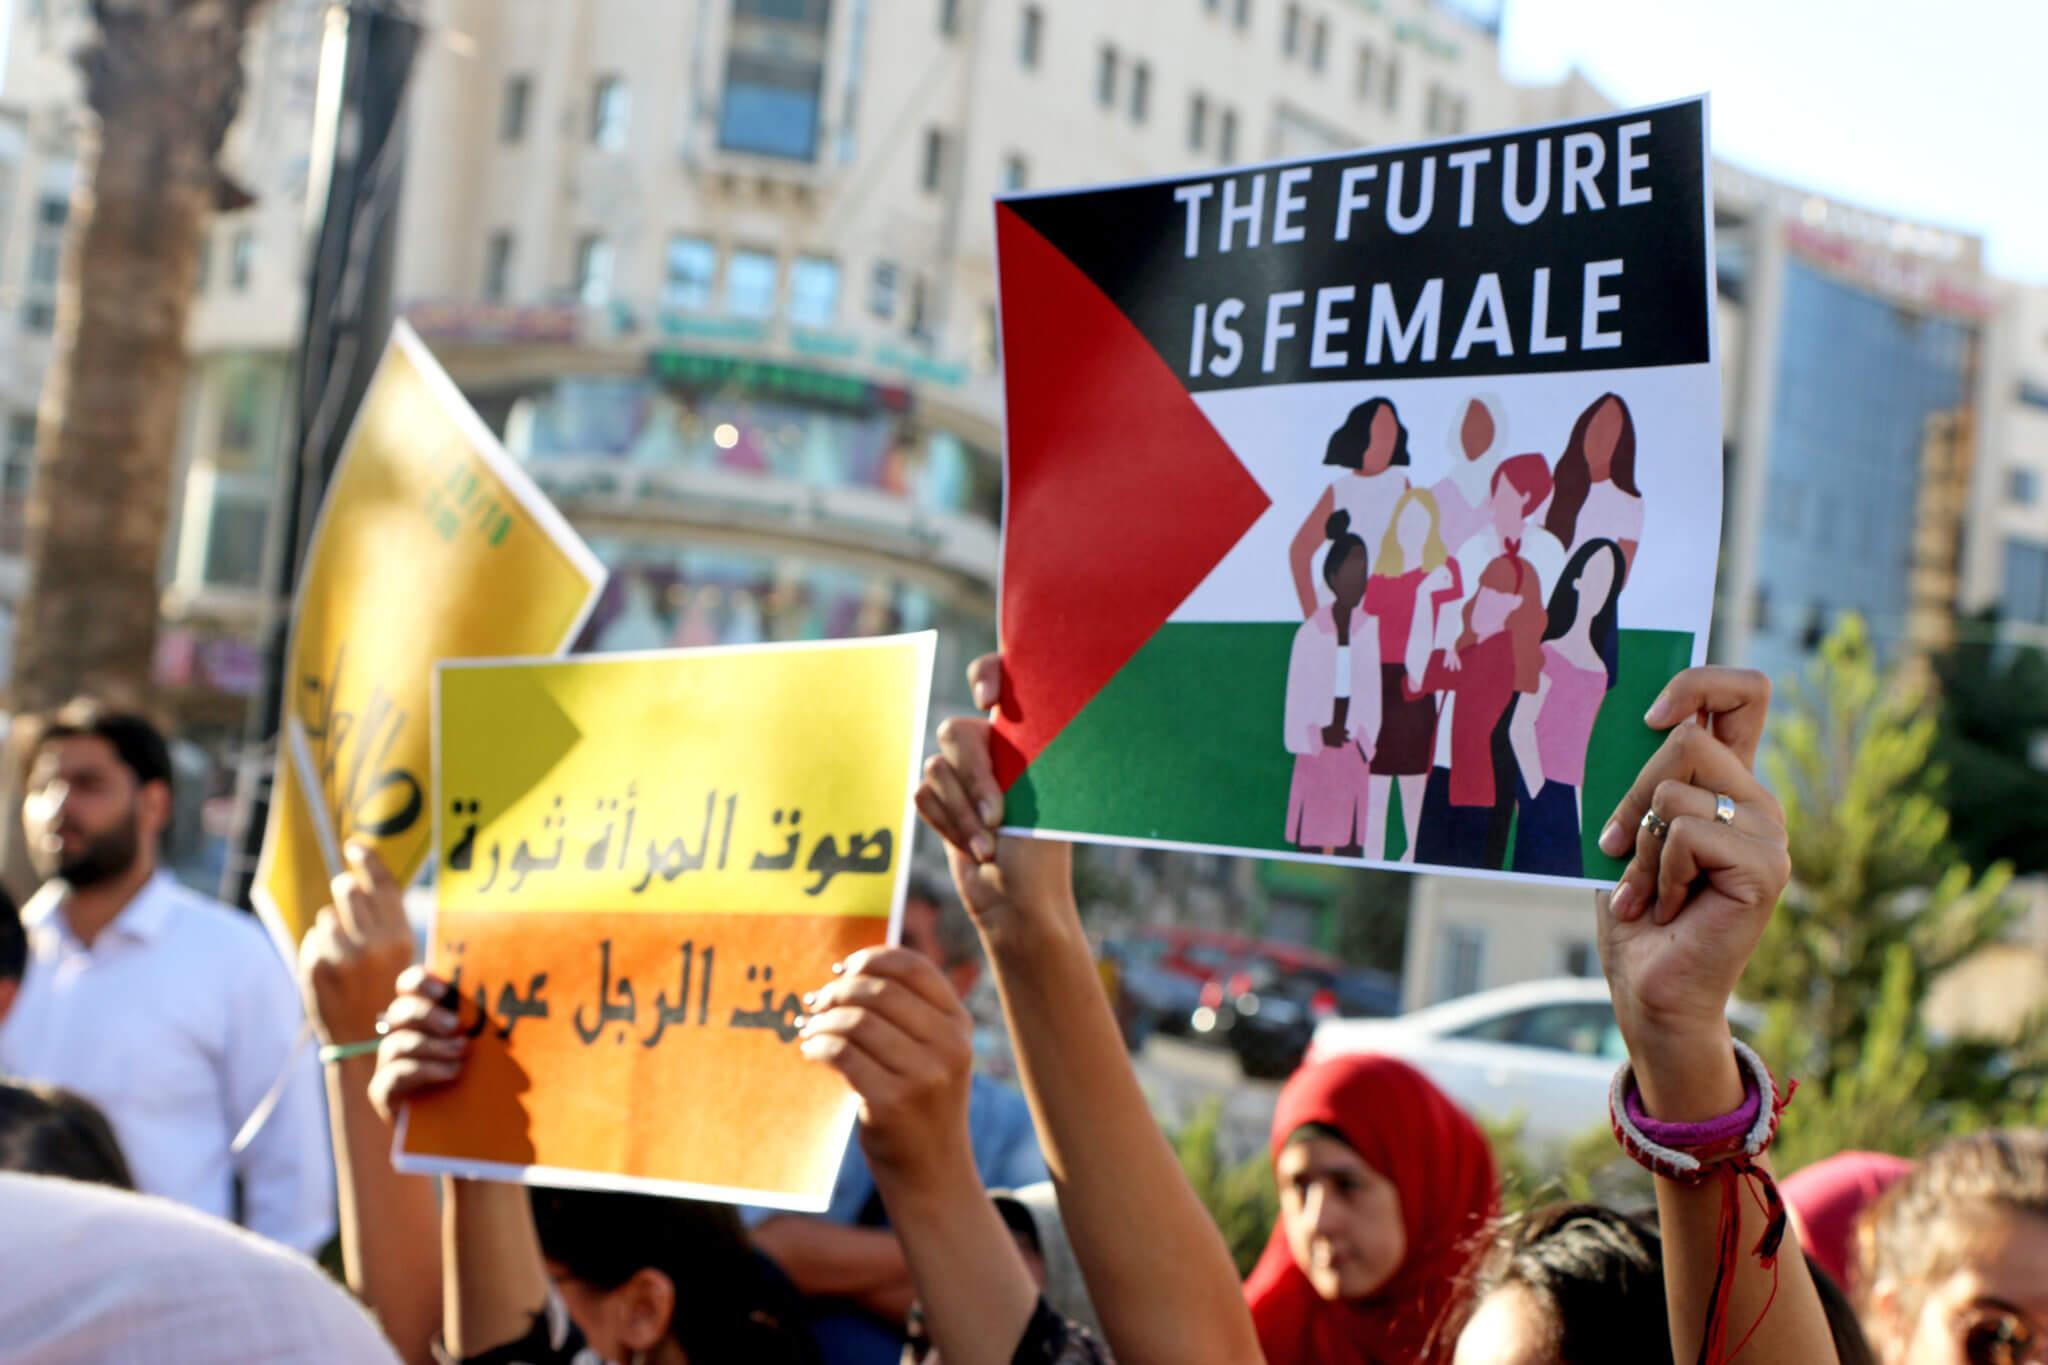 Ramallah city center, Sep 26, 2019. Photo by Ahmad Al-Bazz / Activestills.org